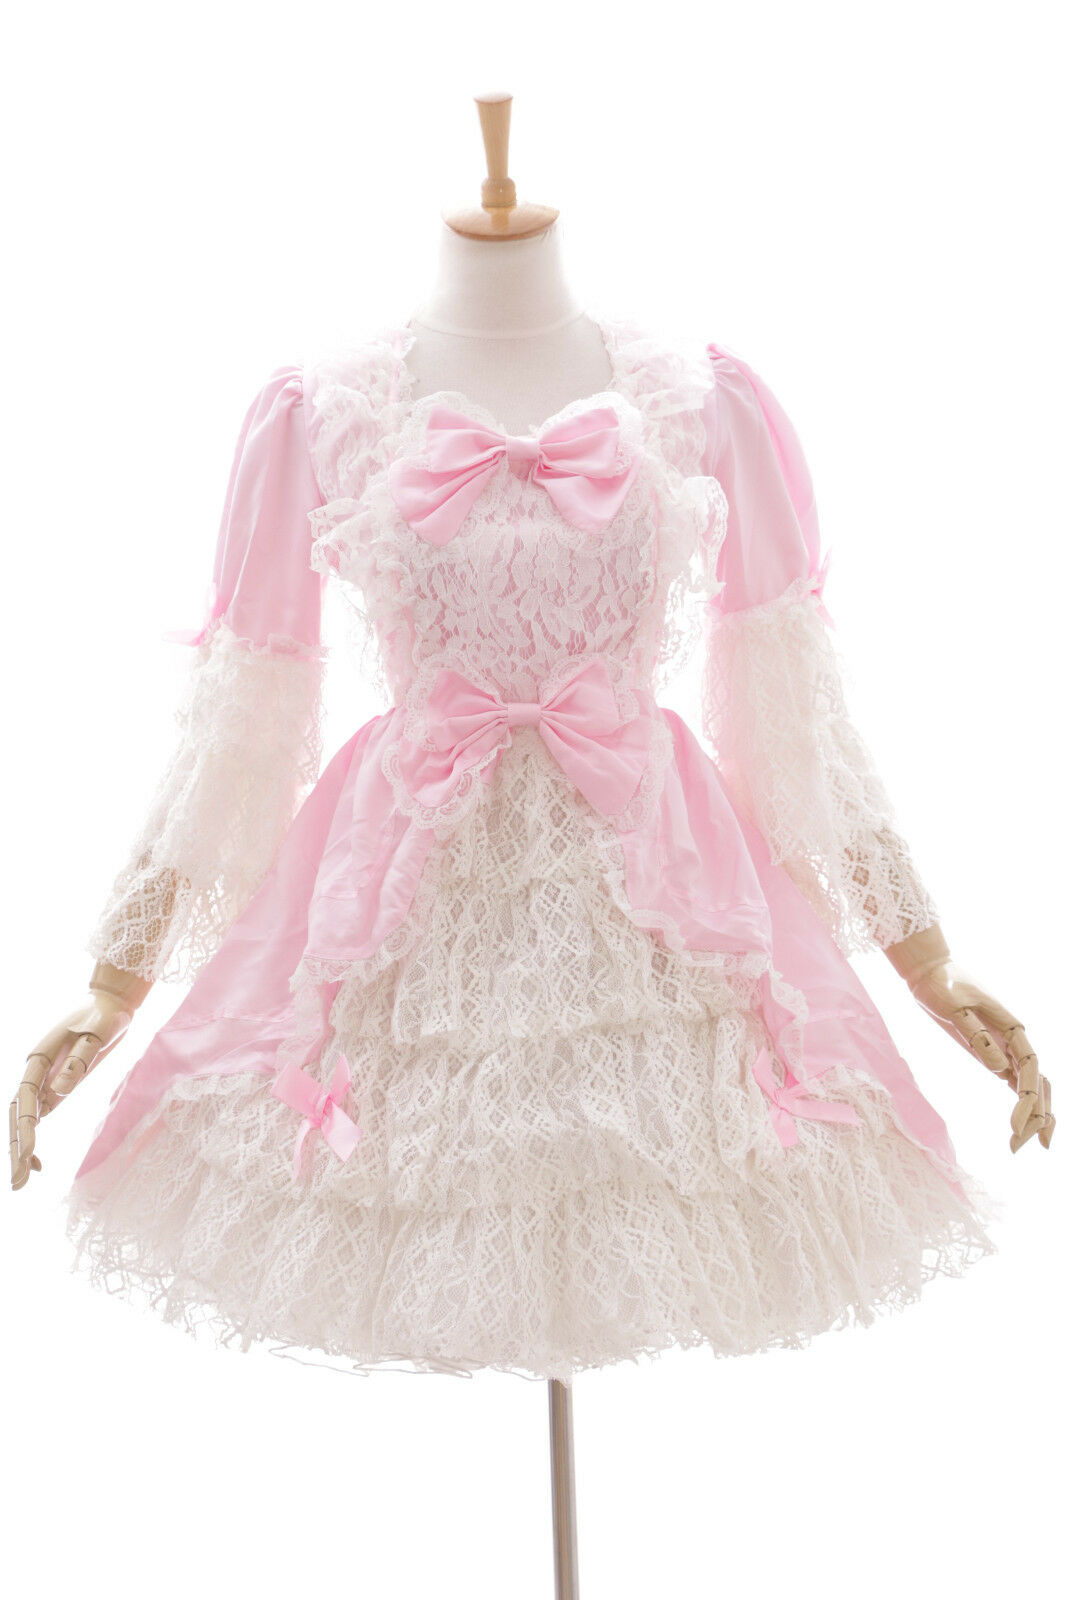 JL-622-1 Rosa weiß langarm Classic Spitze Lace Gothic Lolita Kleid Kostüm dress